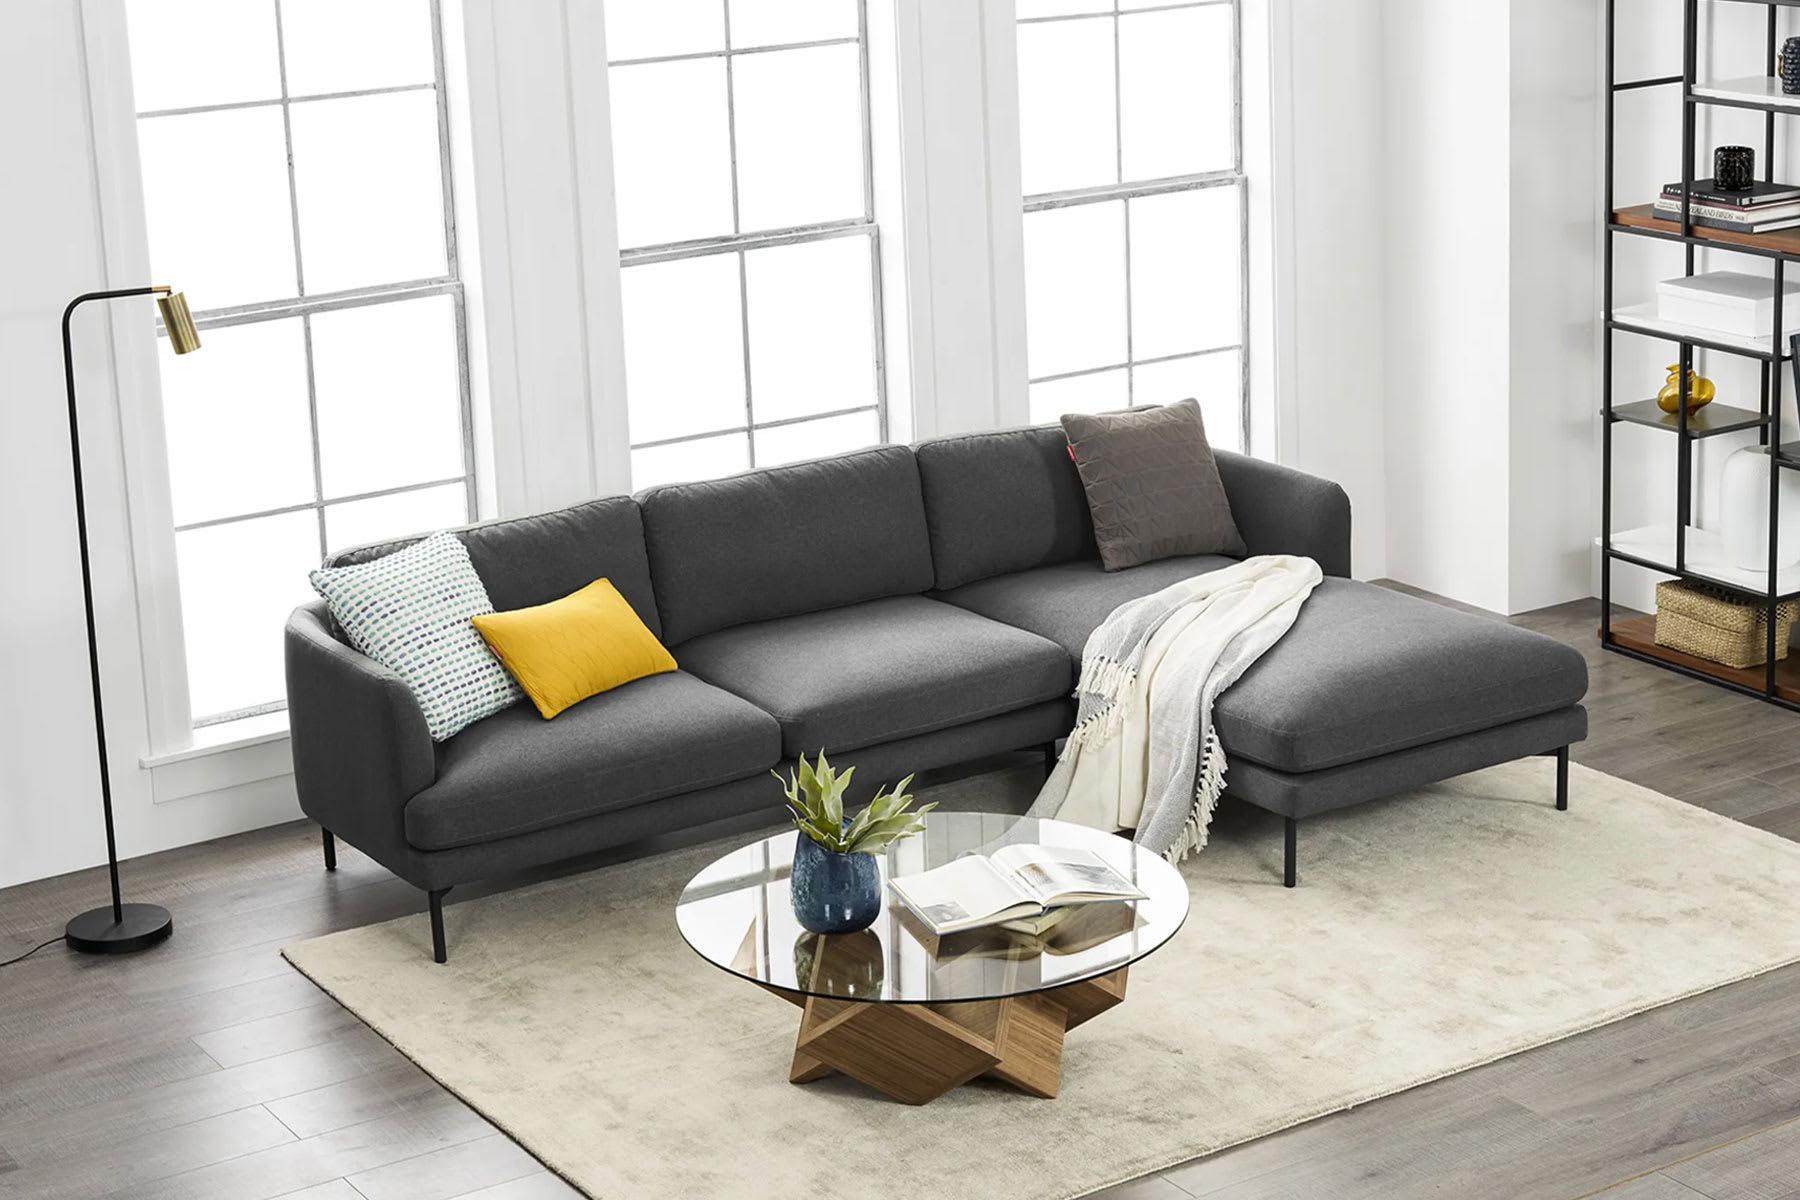 living room with modular sofa, coffee table, rug and standing lamp